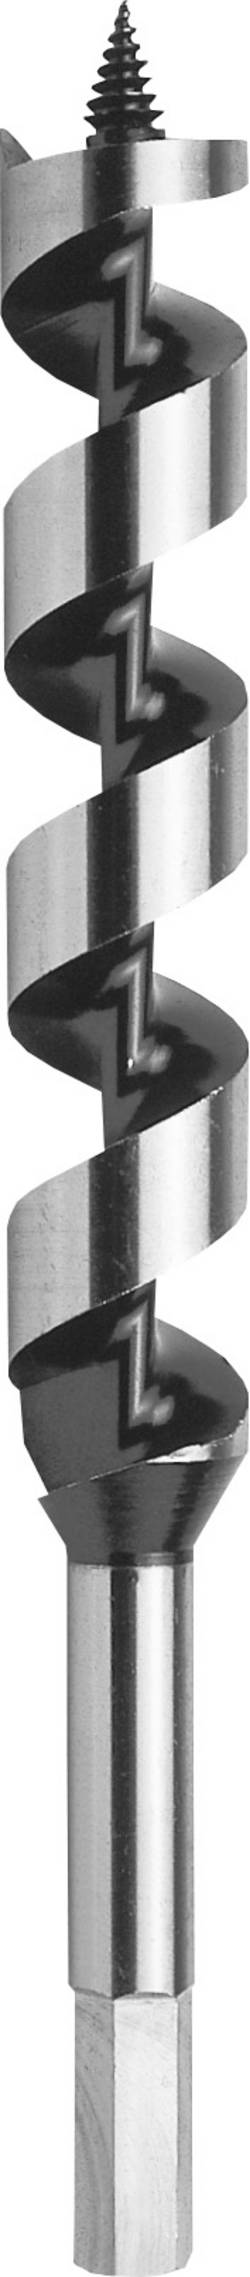 Hadovitý vrták 12 mm Bosch Accessories 2609255236, uchycení šestihran, délka 235 mm 1 ks